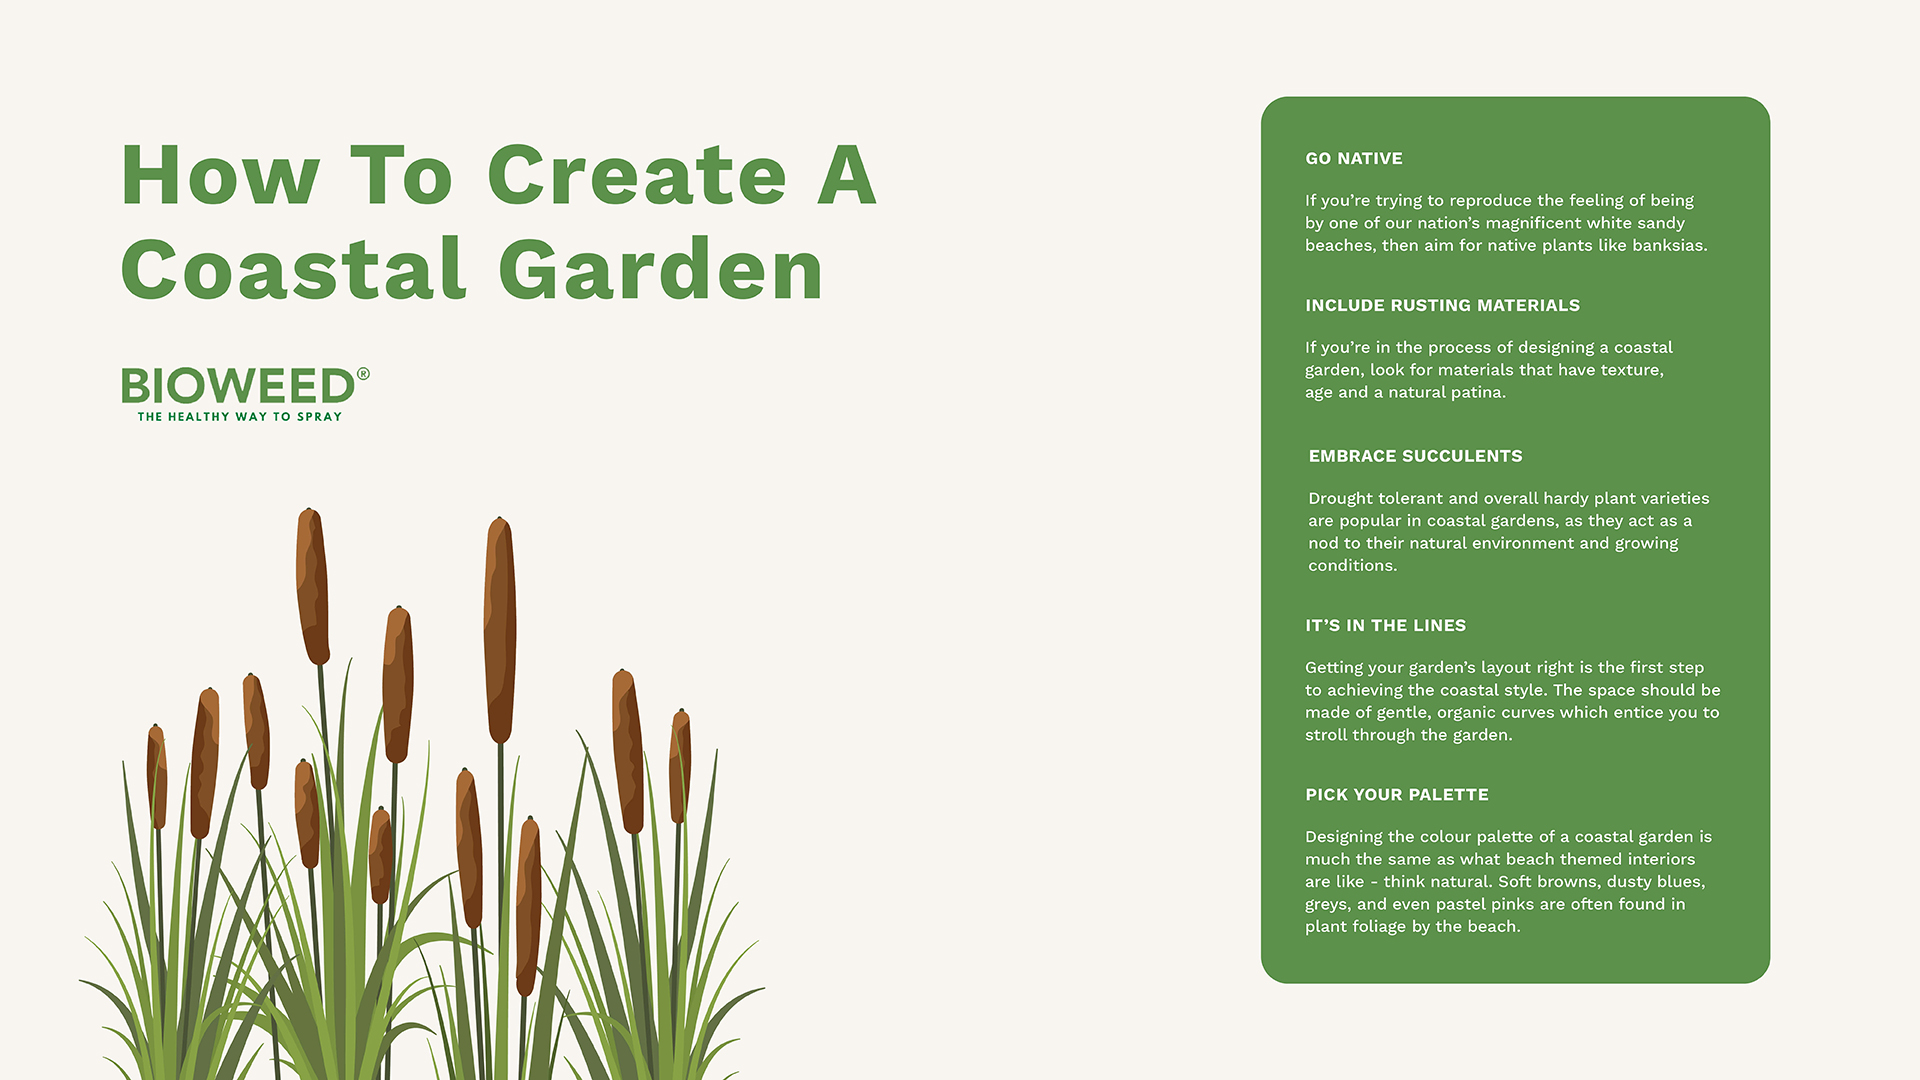 Nailing-The-Coastal-Garden-Look3 (5)